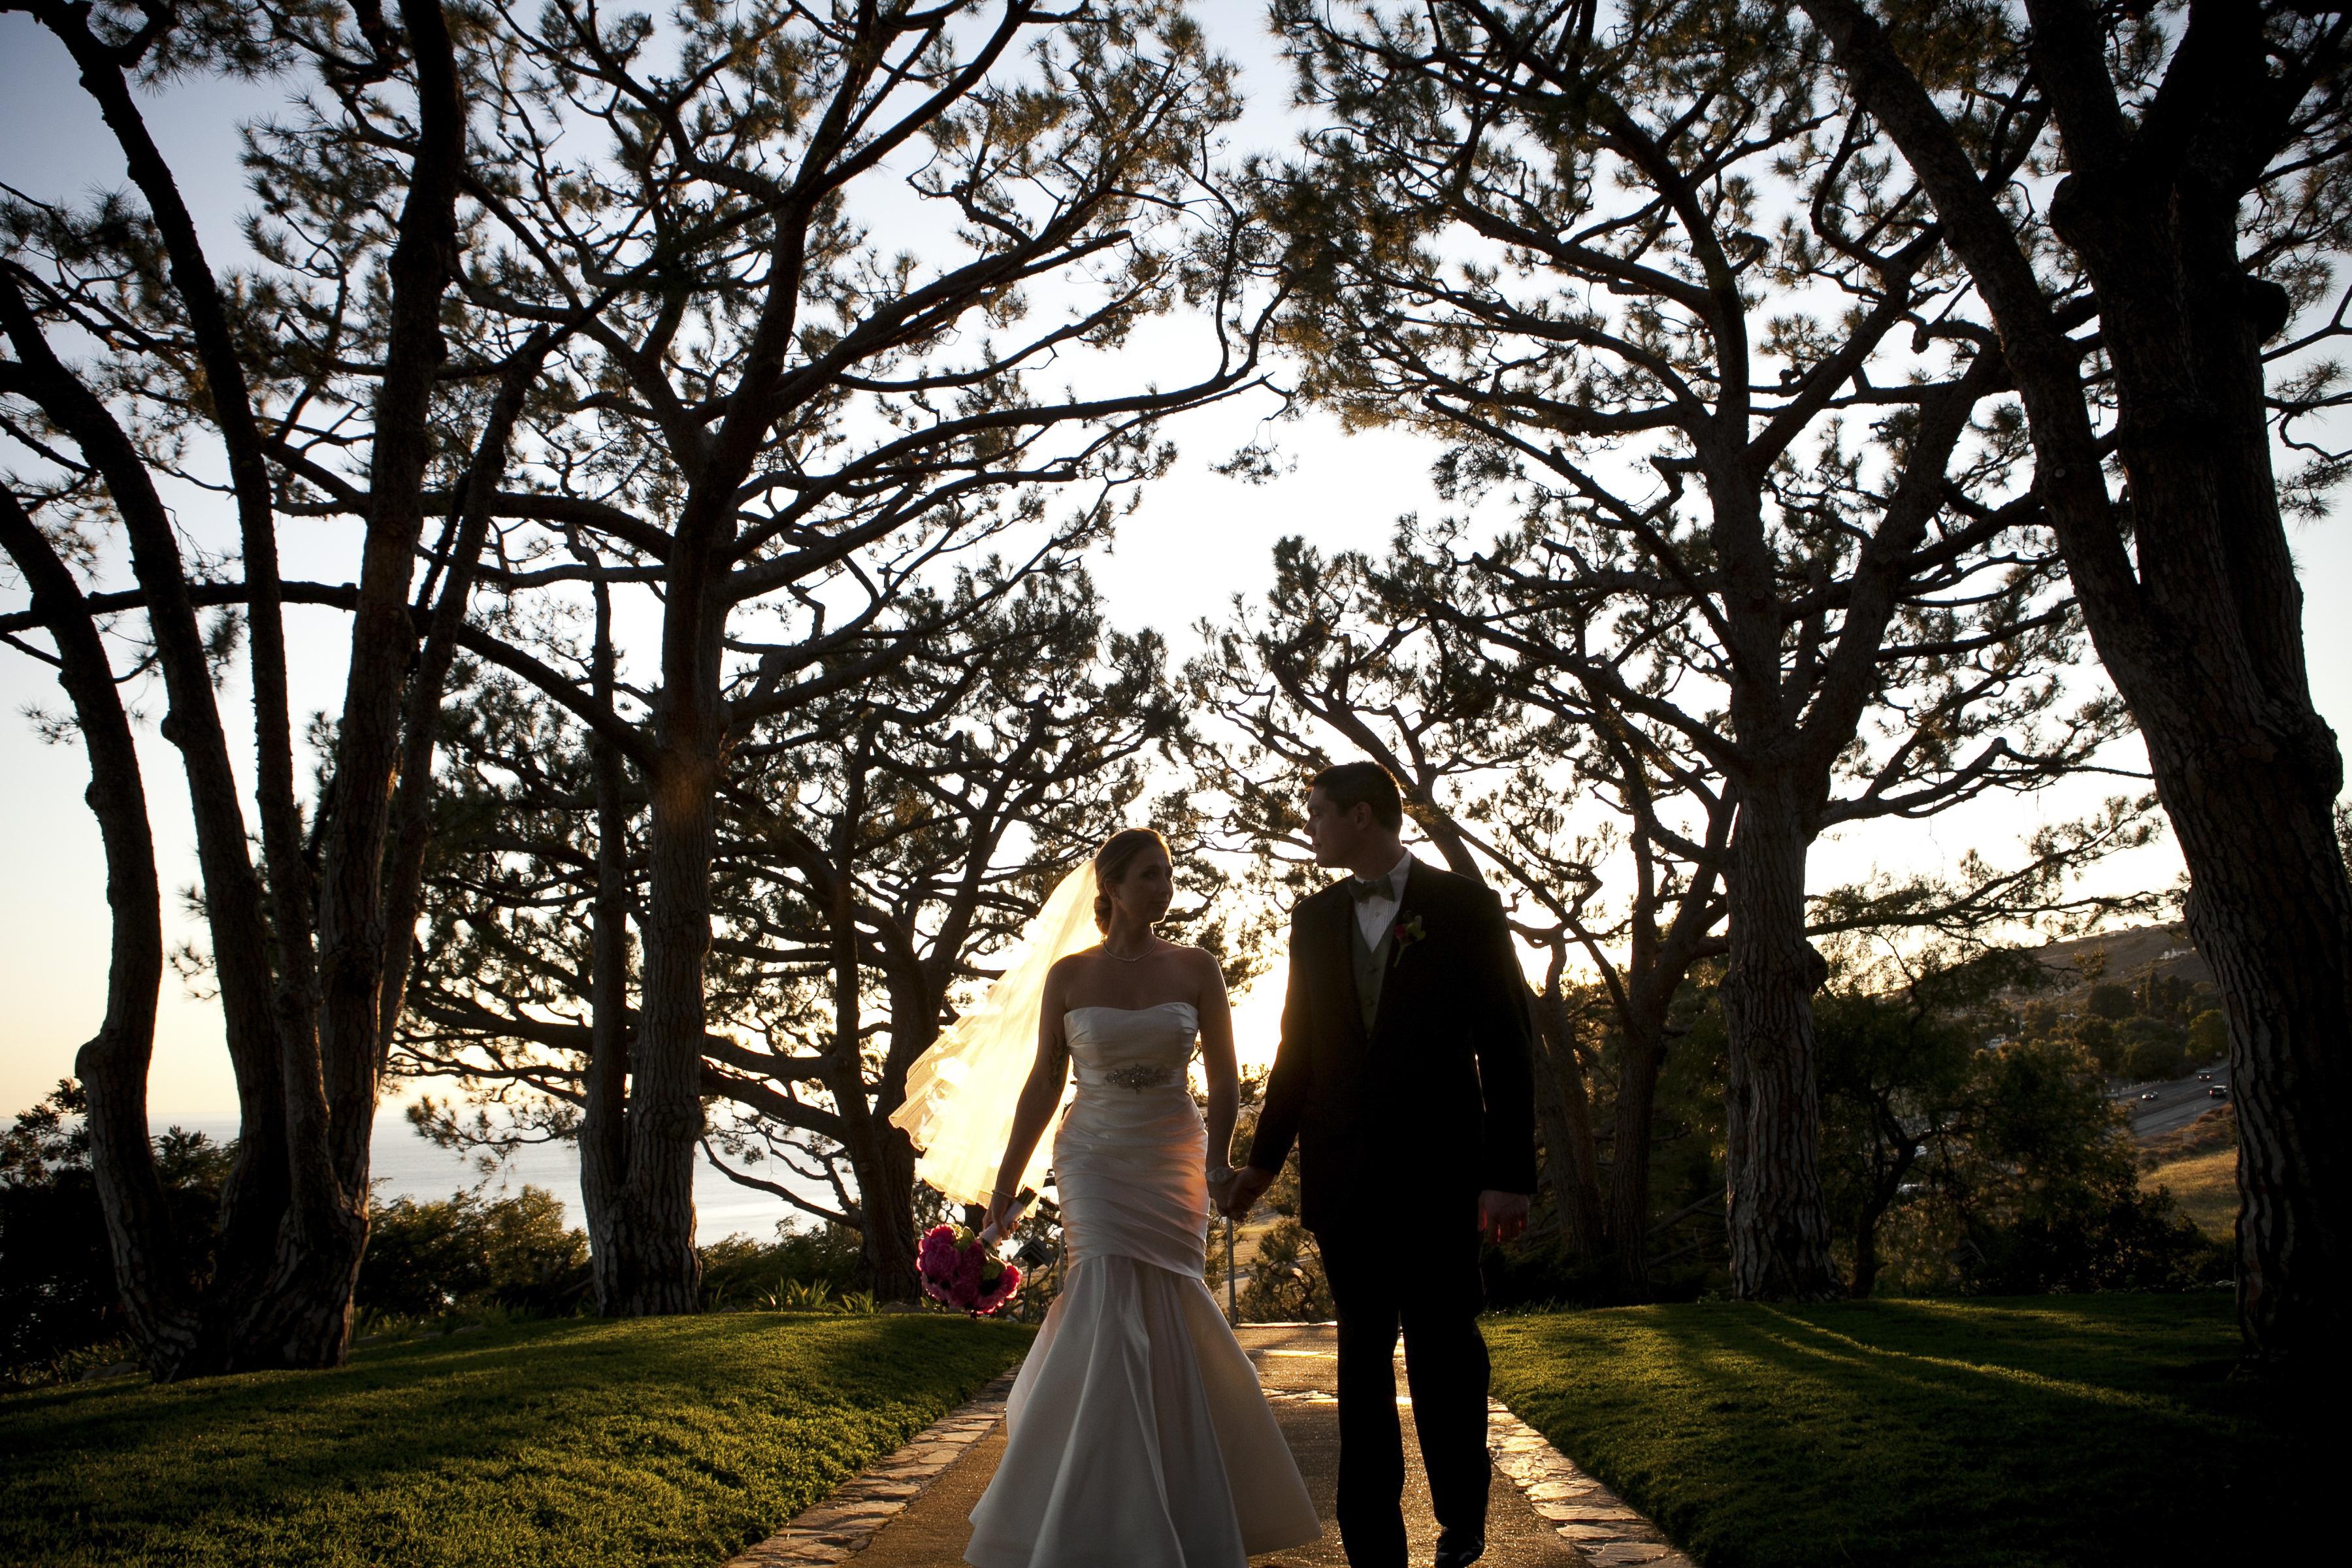 https://sleeklens.com/wp-content/uploads/2018/09/wedding-lightroom-presets-signature-bride-groom-before-13.jpg